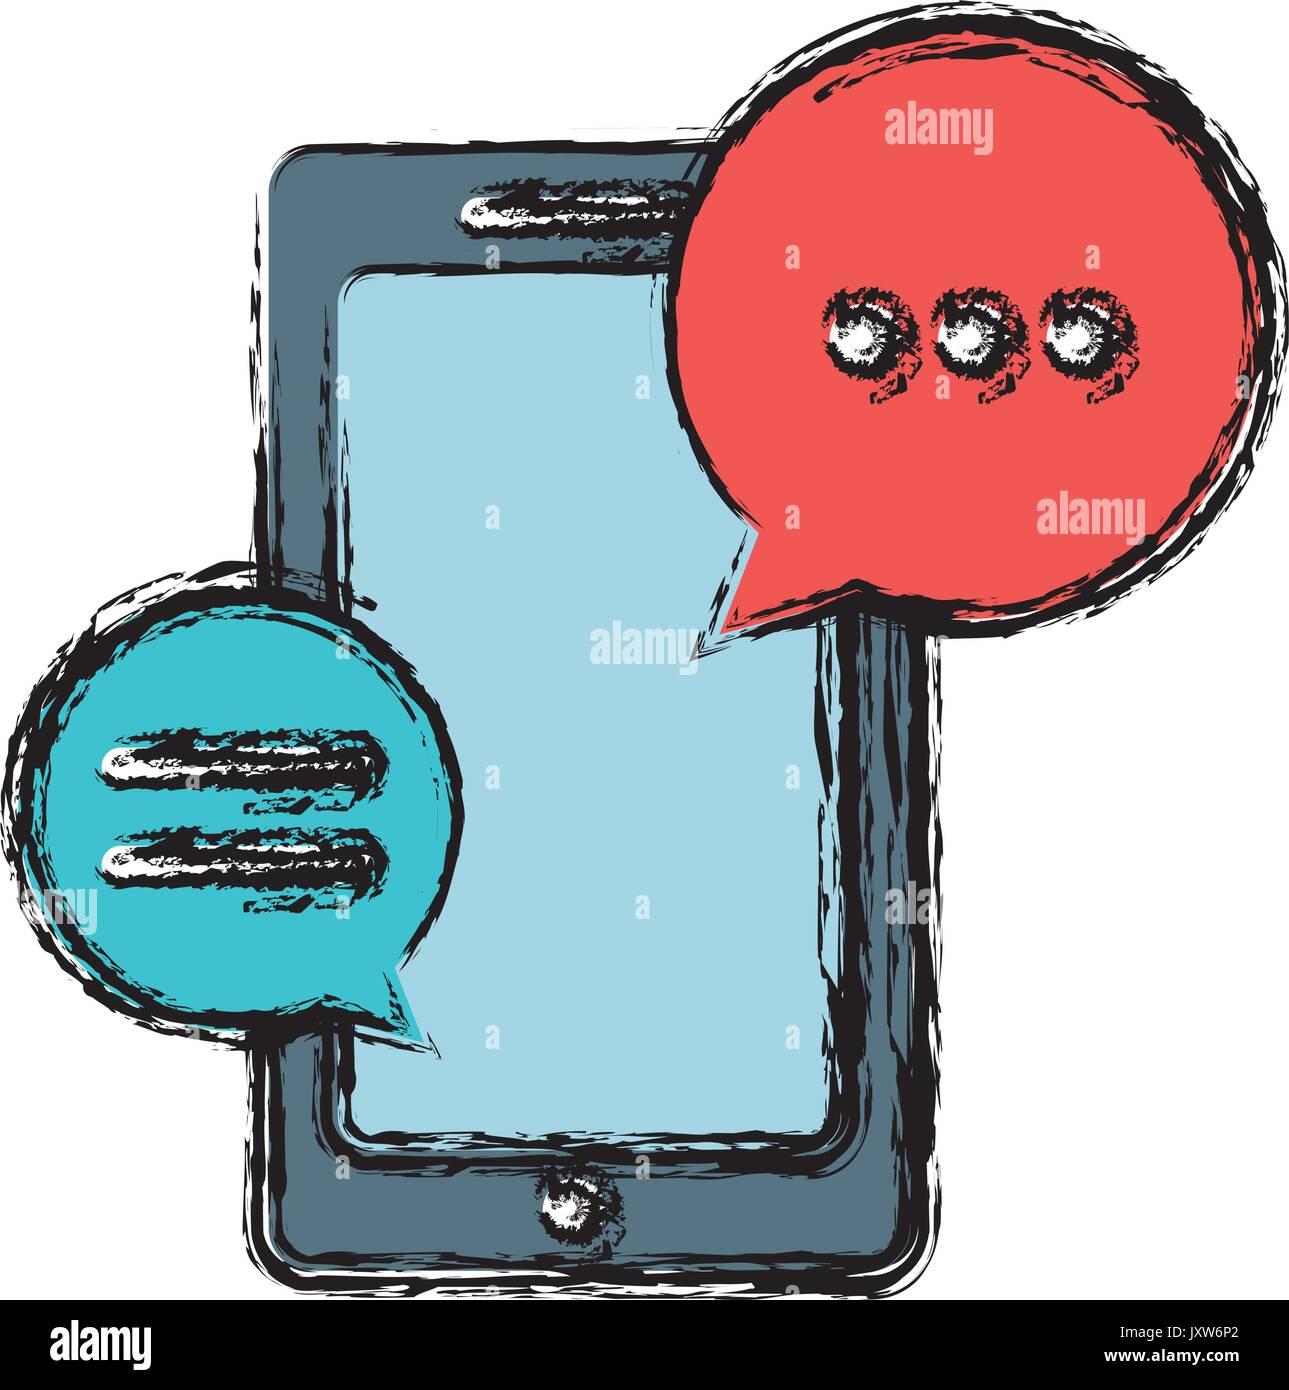 smartphone device icon - Stock Image